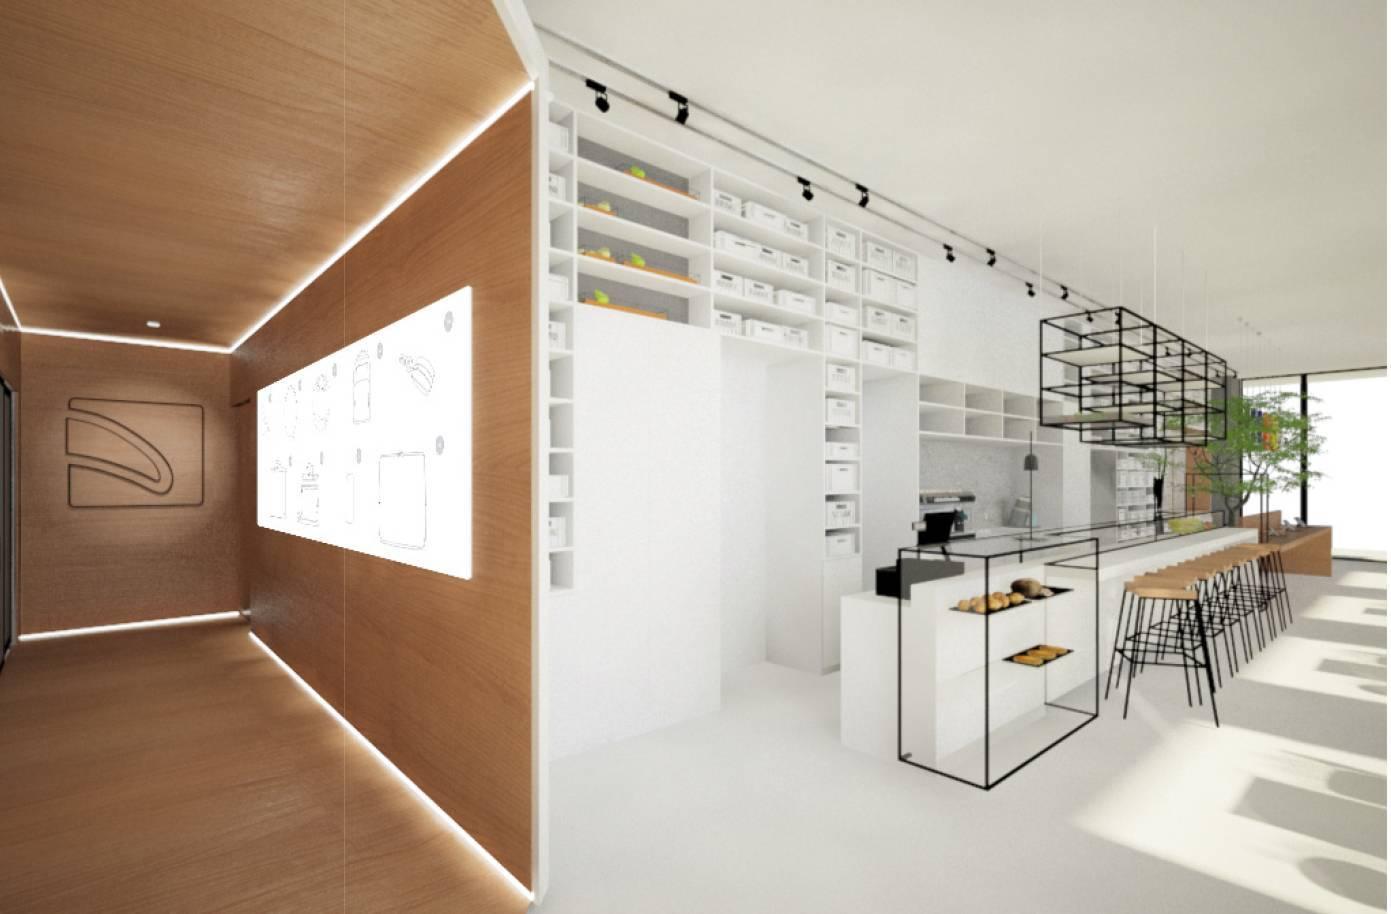 Giat Tucano Caffe' Concept Store Milan, It Milan, It Interior   1915